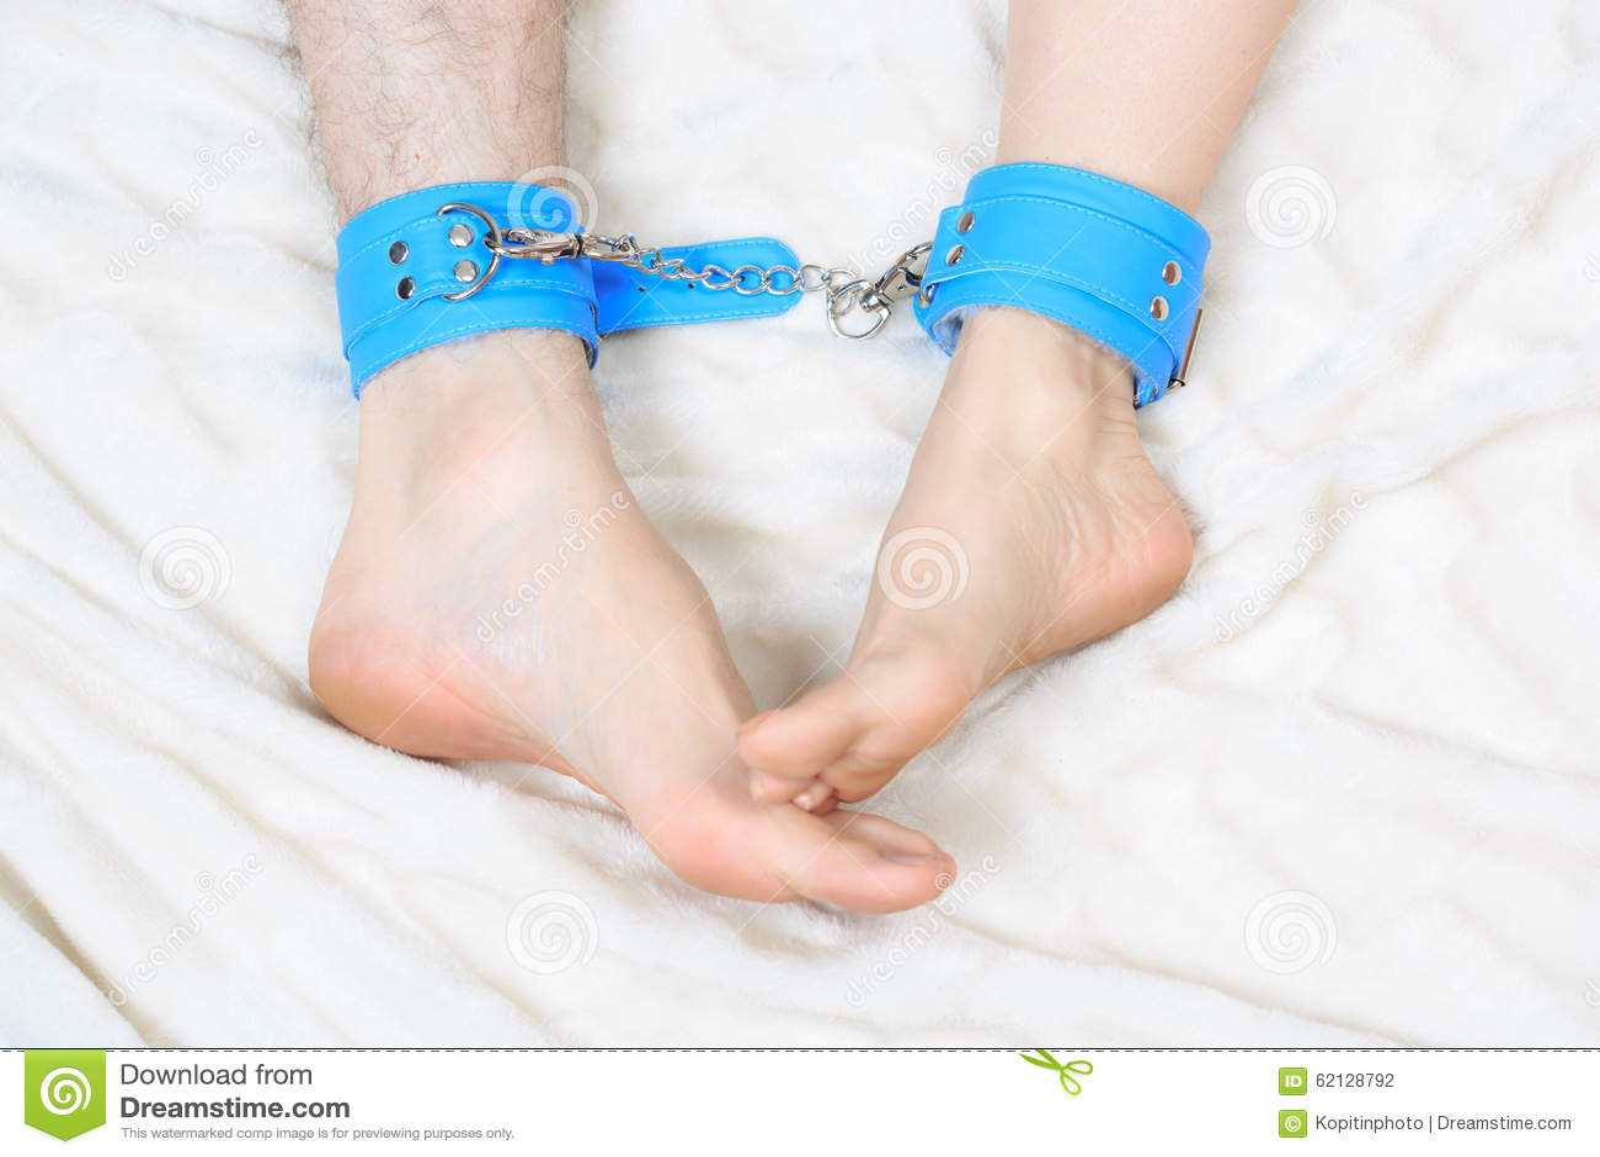 Apologise, too bondage female handcuffs leg sex apologise, but